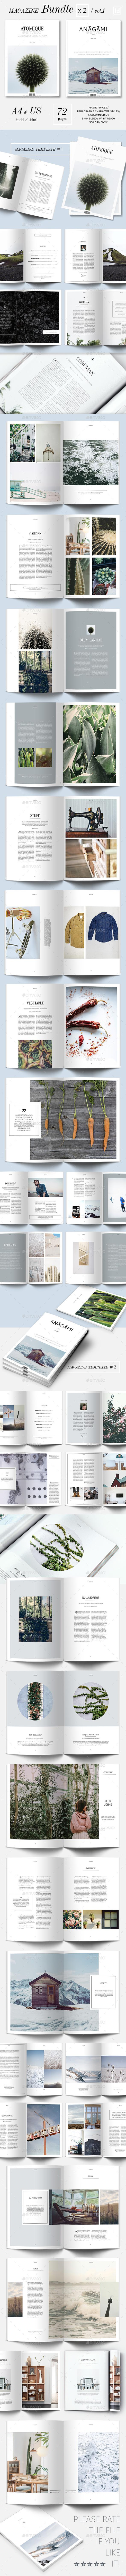 Magazine Template Bundle 01 - Magazines Print Templates